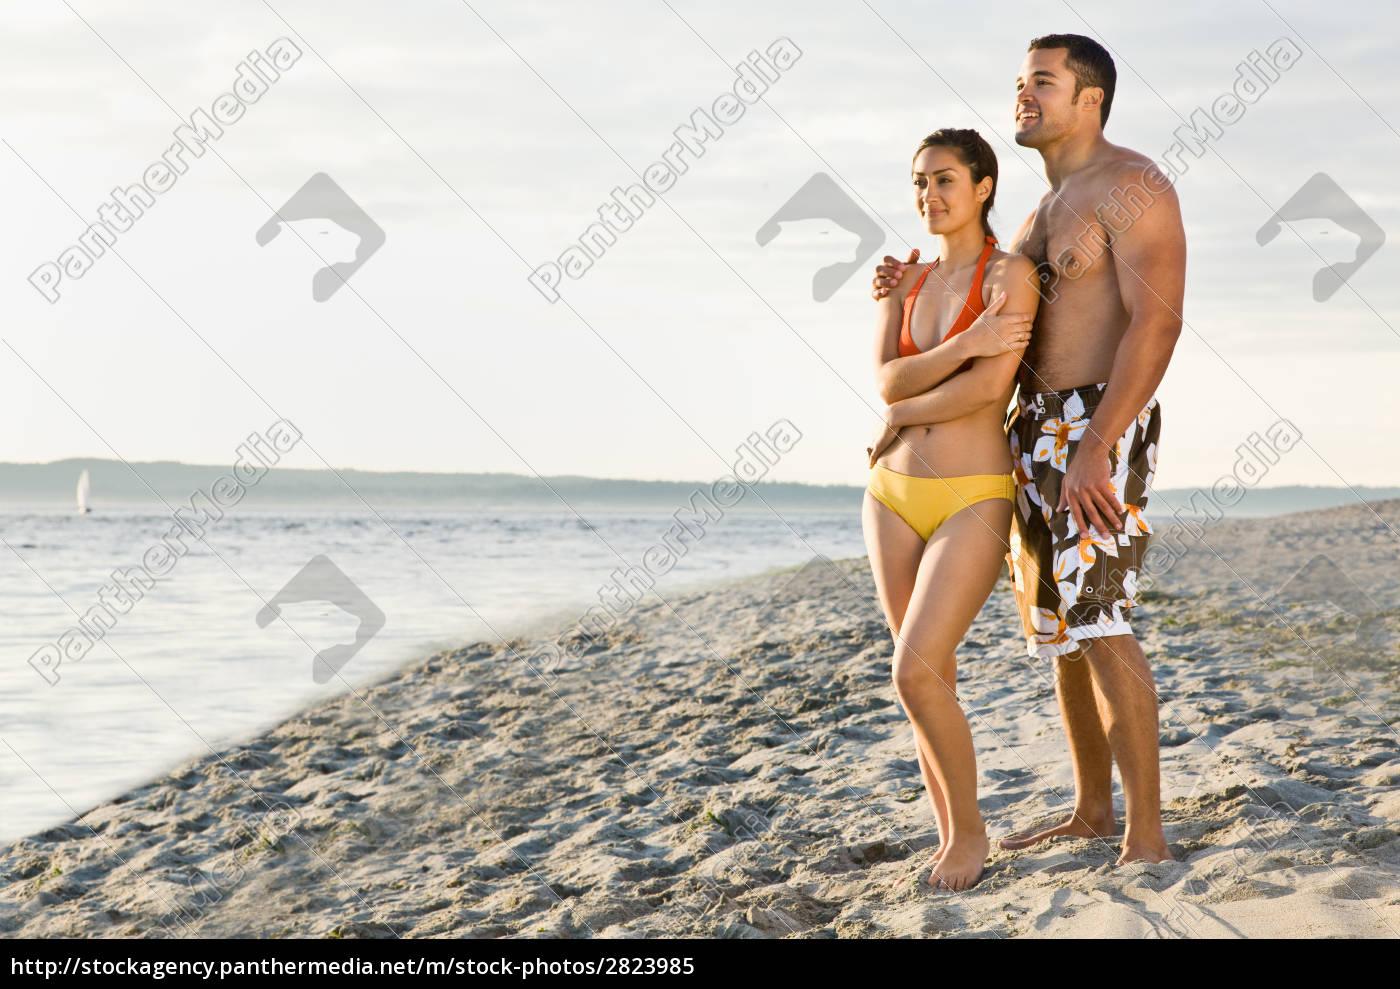 couple, hugging, on, beach - 2823985